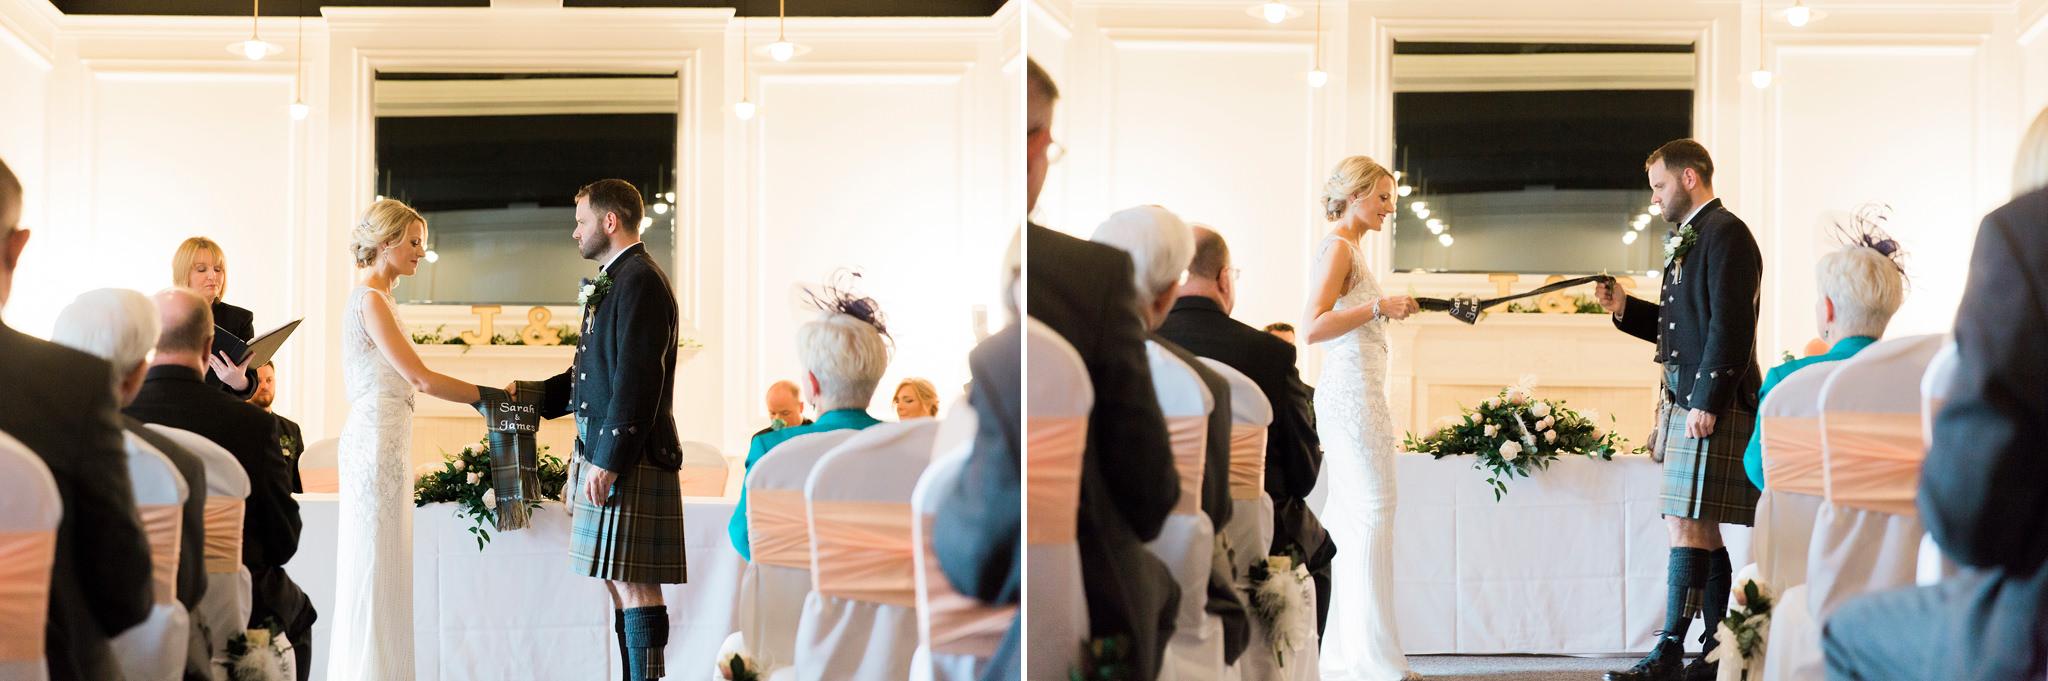 074-wedding-photography-peebles.jpg